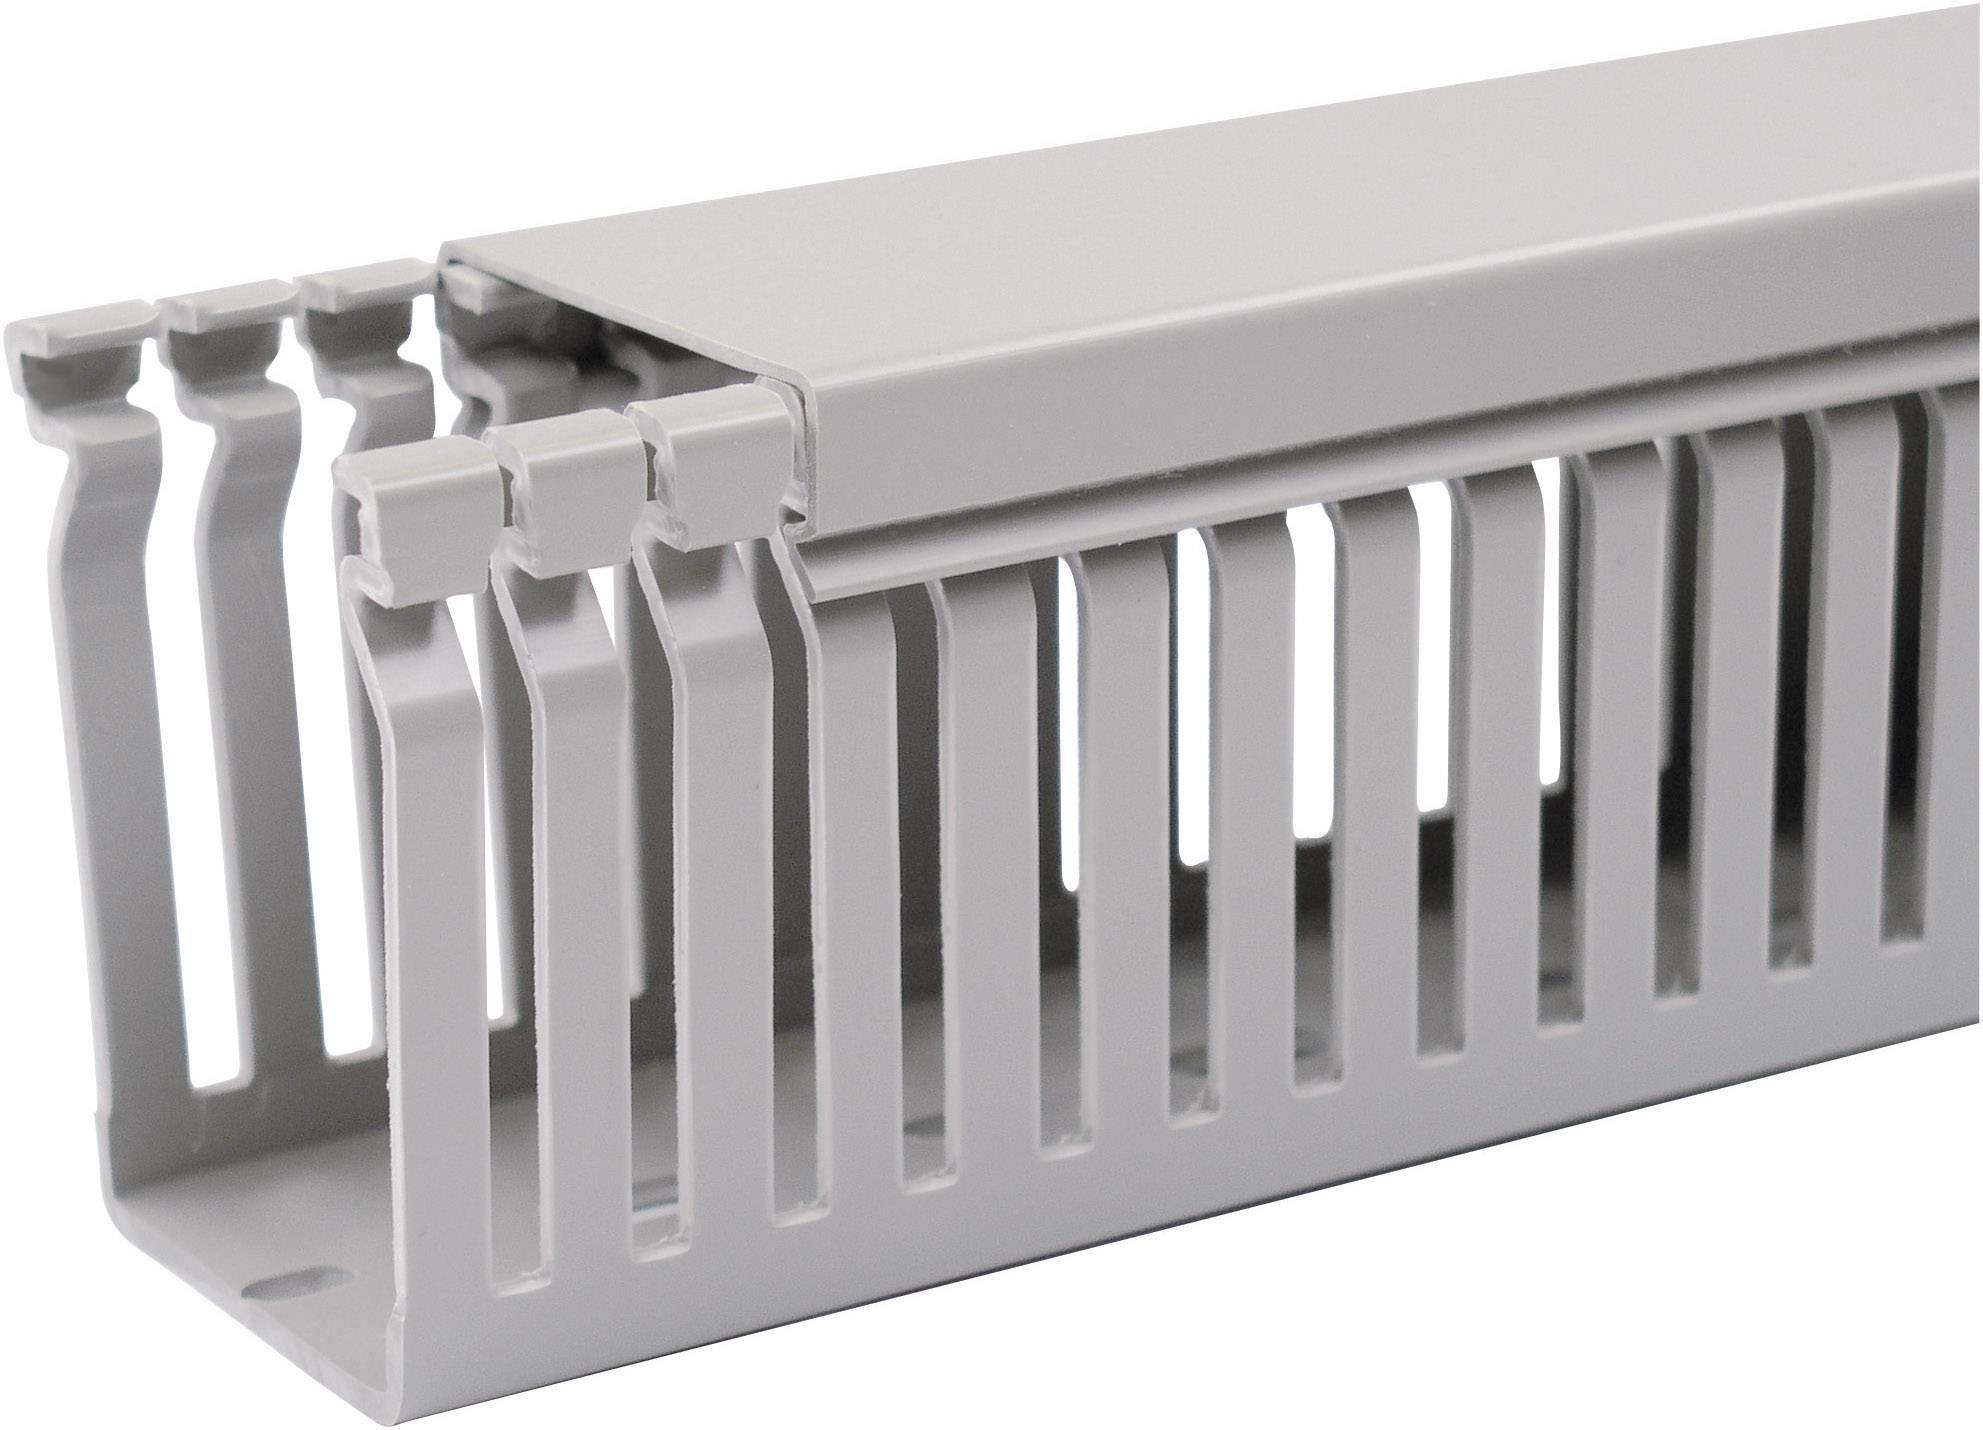 Elektroinstalační lišta OBO Bettermann, 6178012, 40 x 40 mm, 2 m, šedá